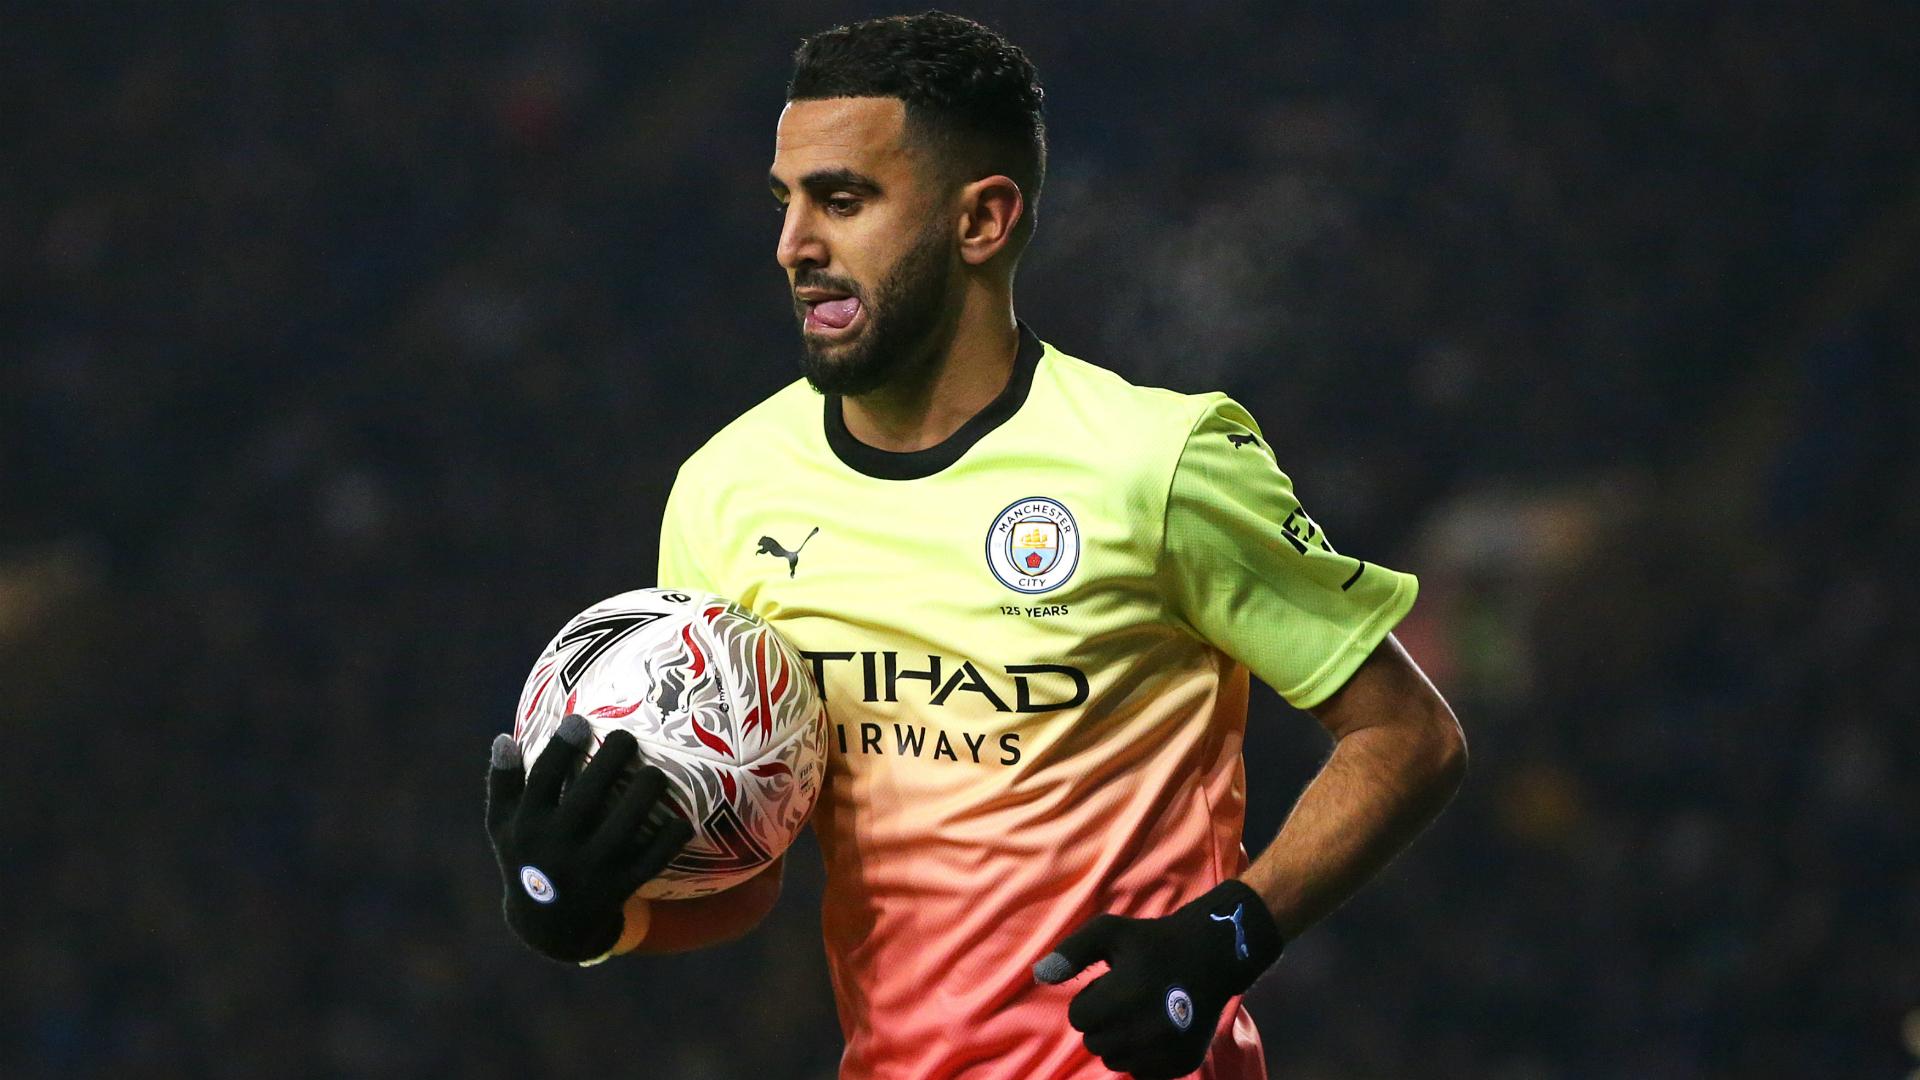 Rumour Has It: Man City's Mahrez open to PSG move, Juve eye Pogba alternative